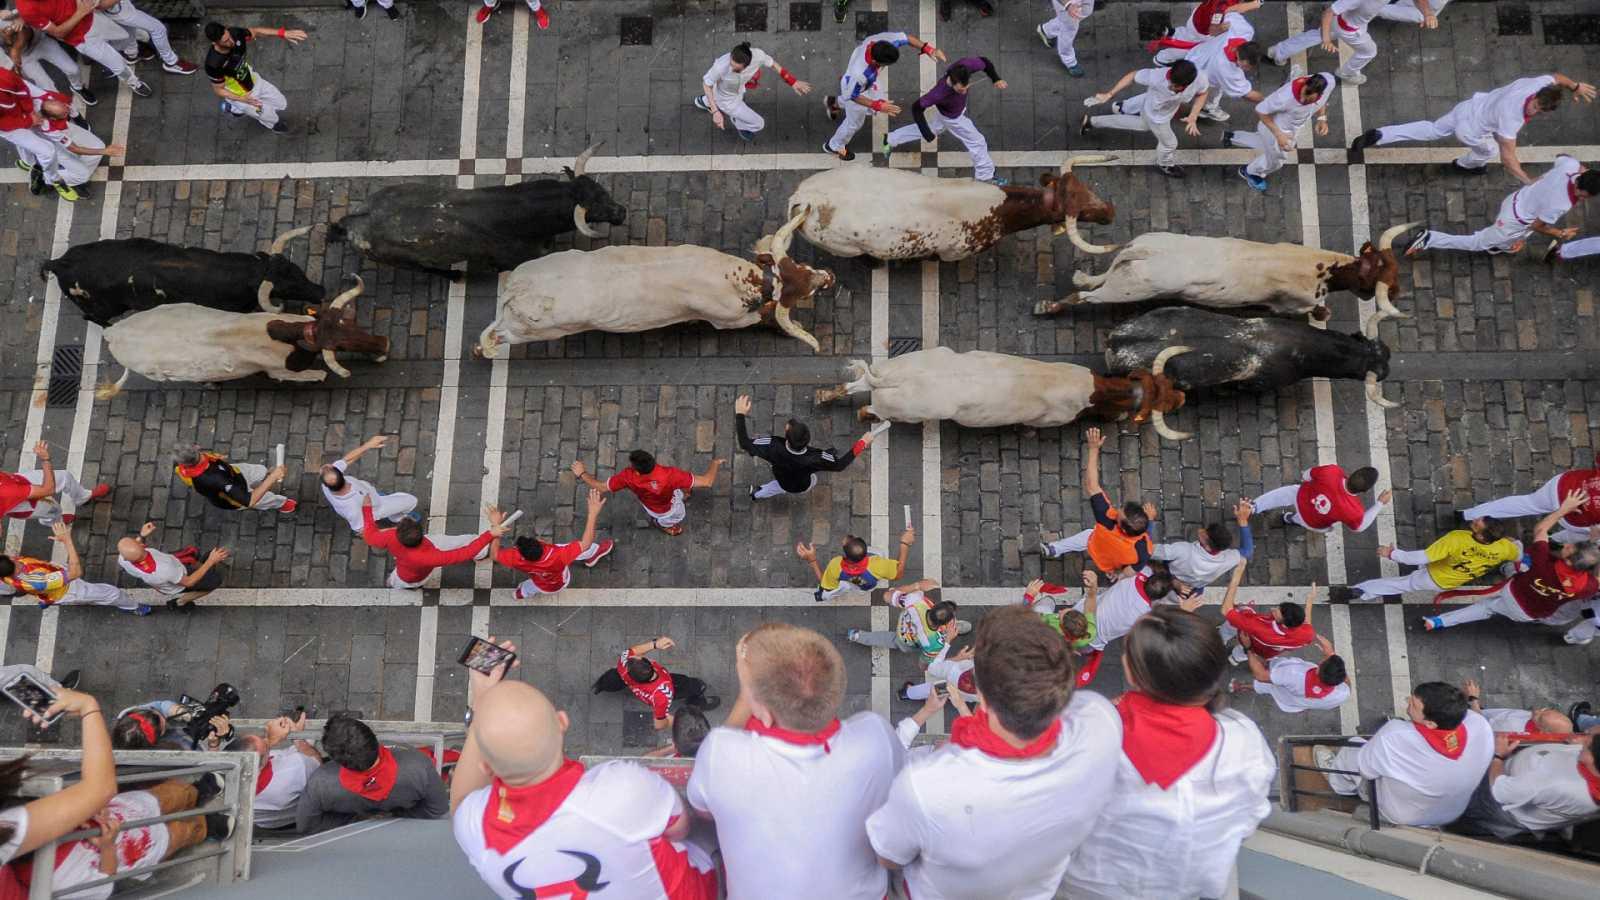 La pandemia vuelve a dejar a Pamplona sin sanfermines